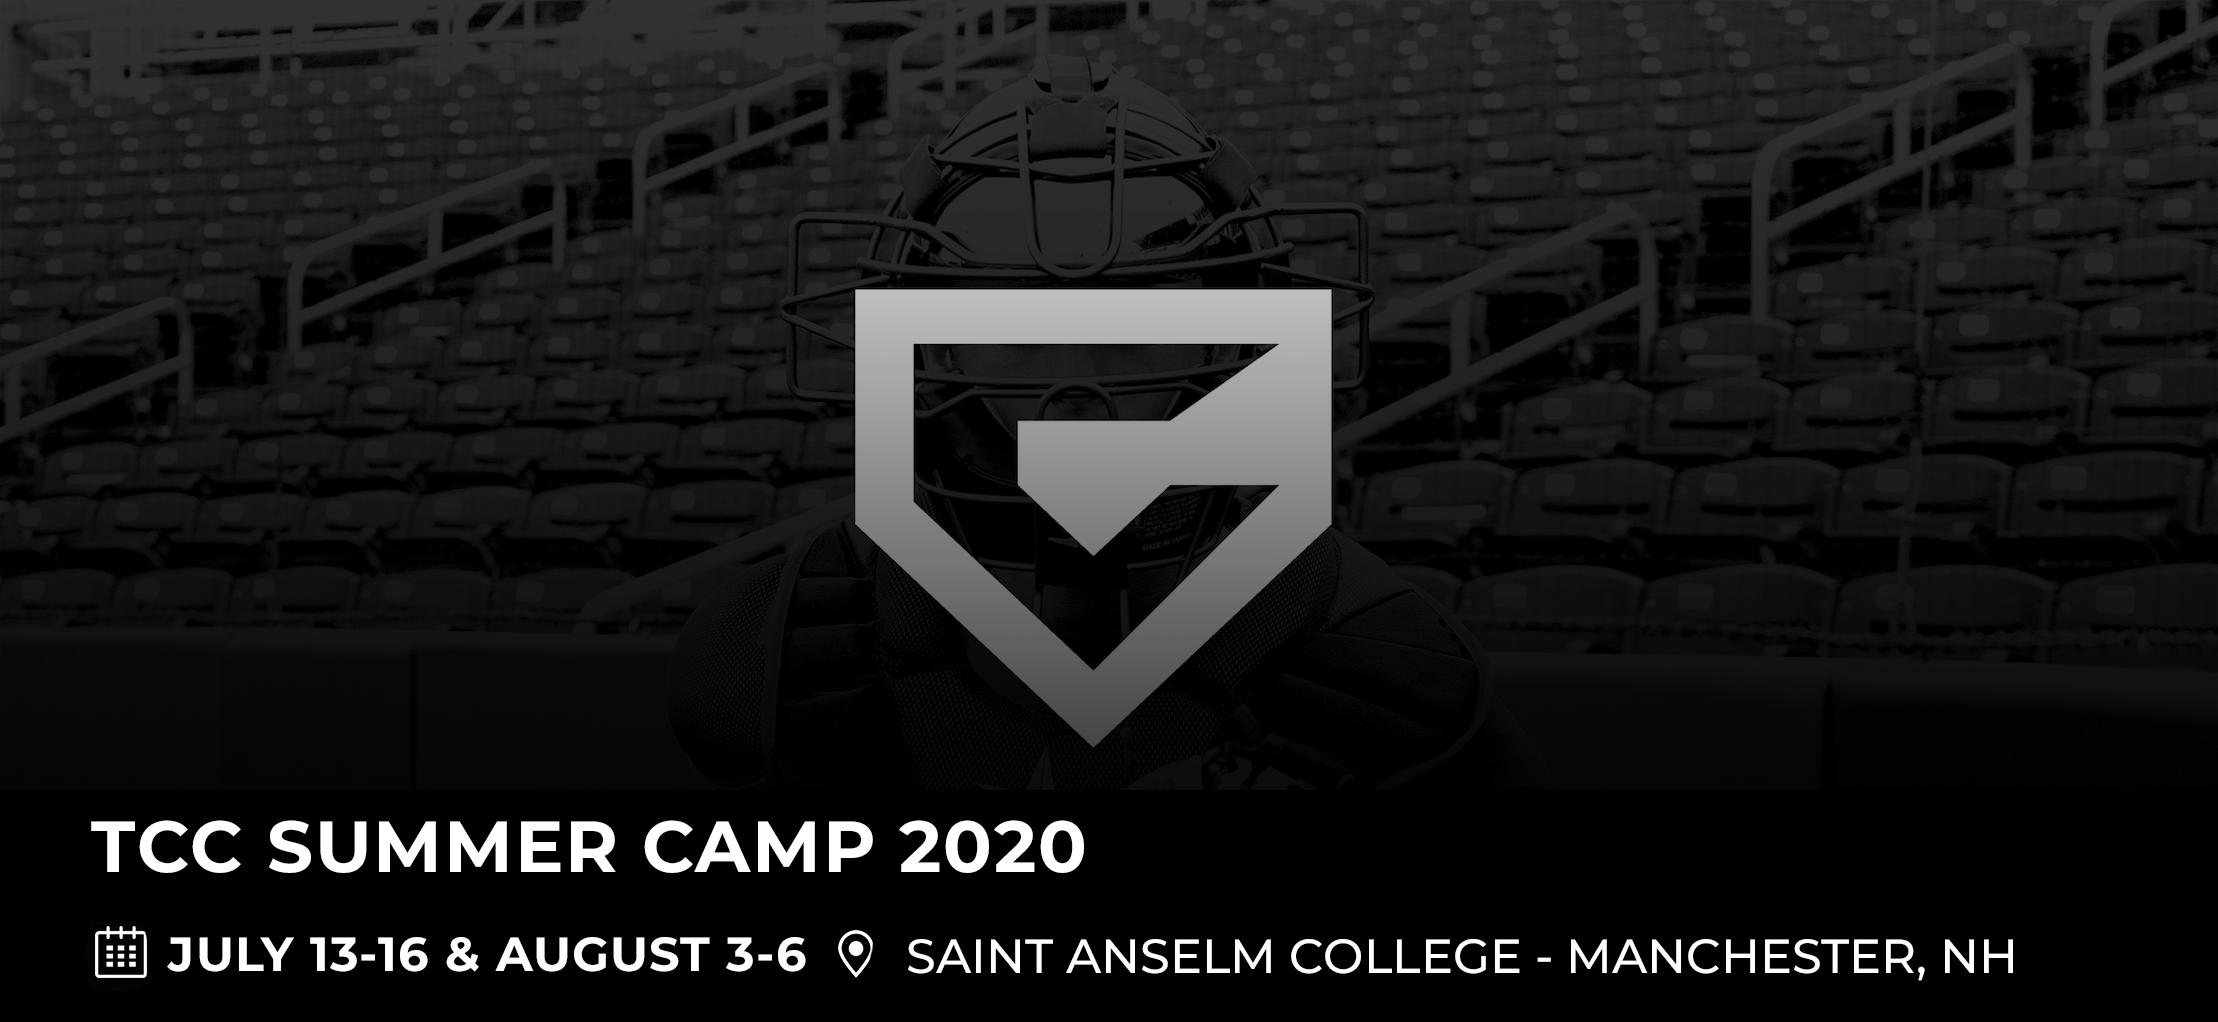 TCC SUMMER CAMP 2020 - AUGUST